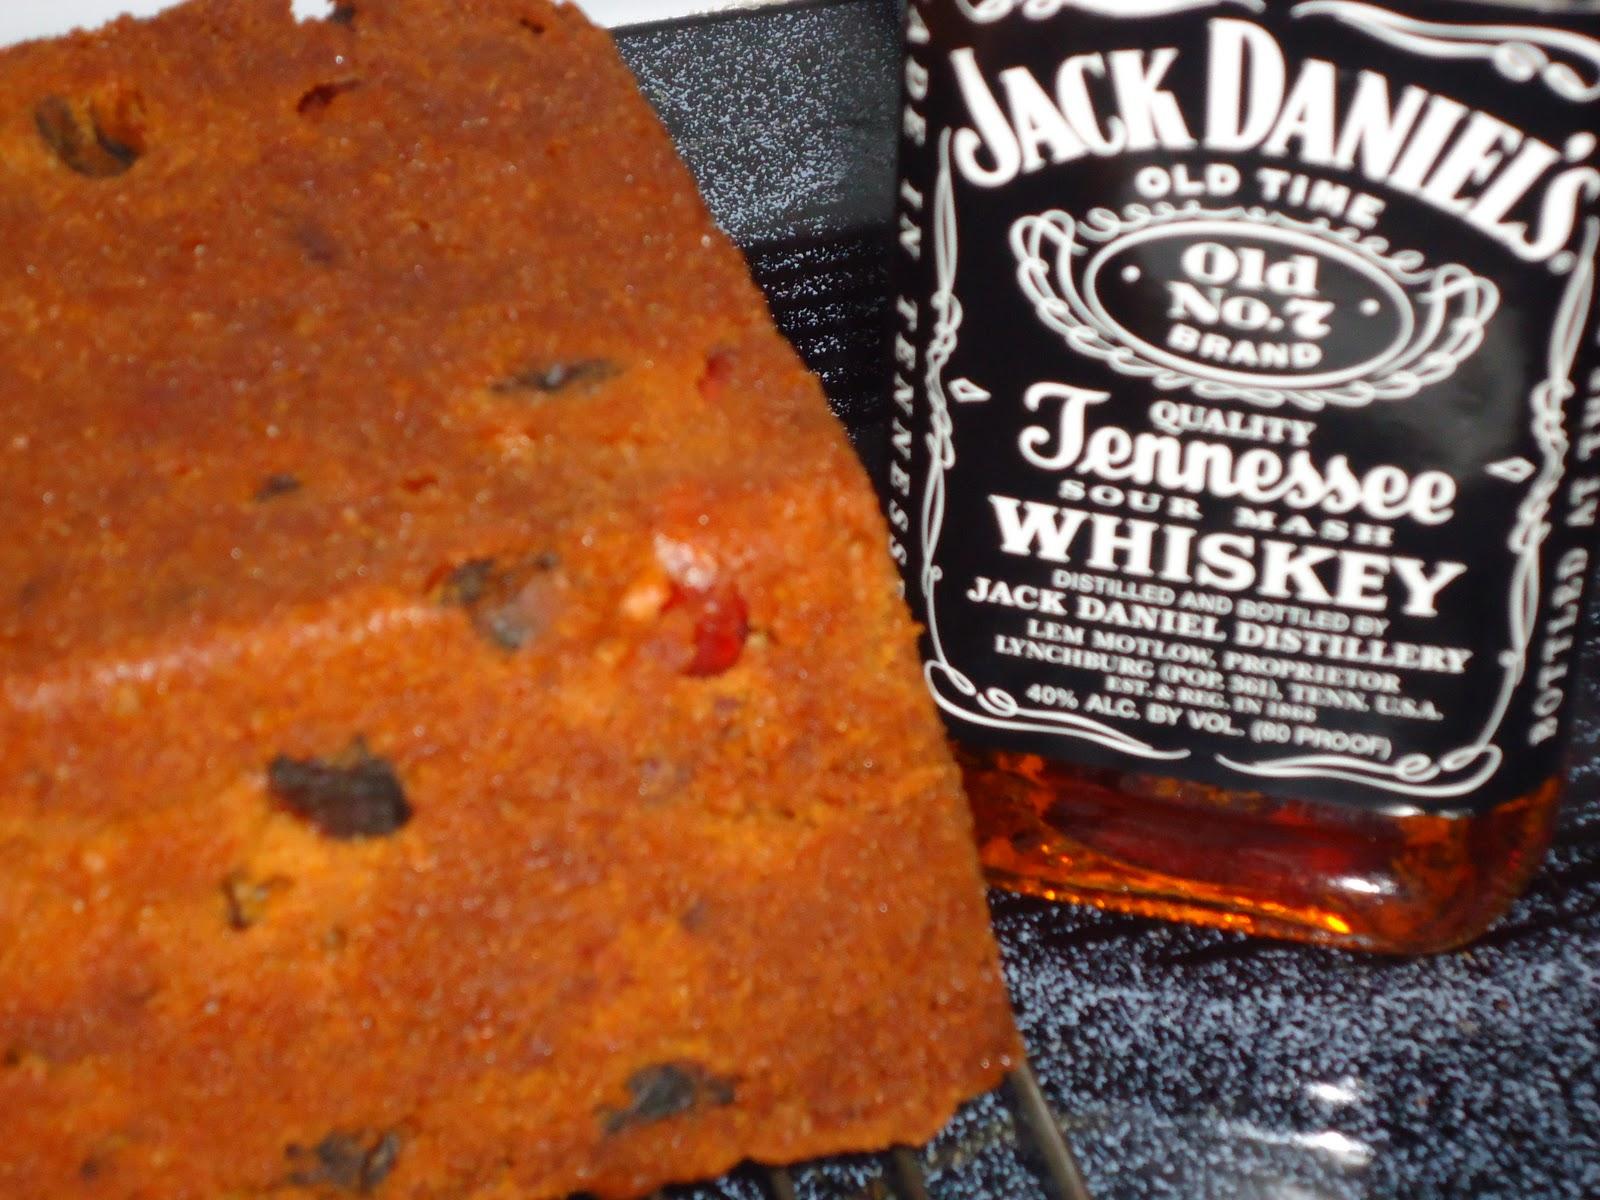 Jack Daniels Bundt Cake